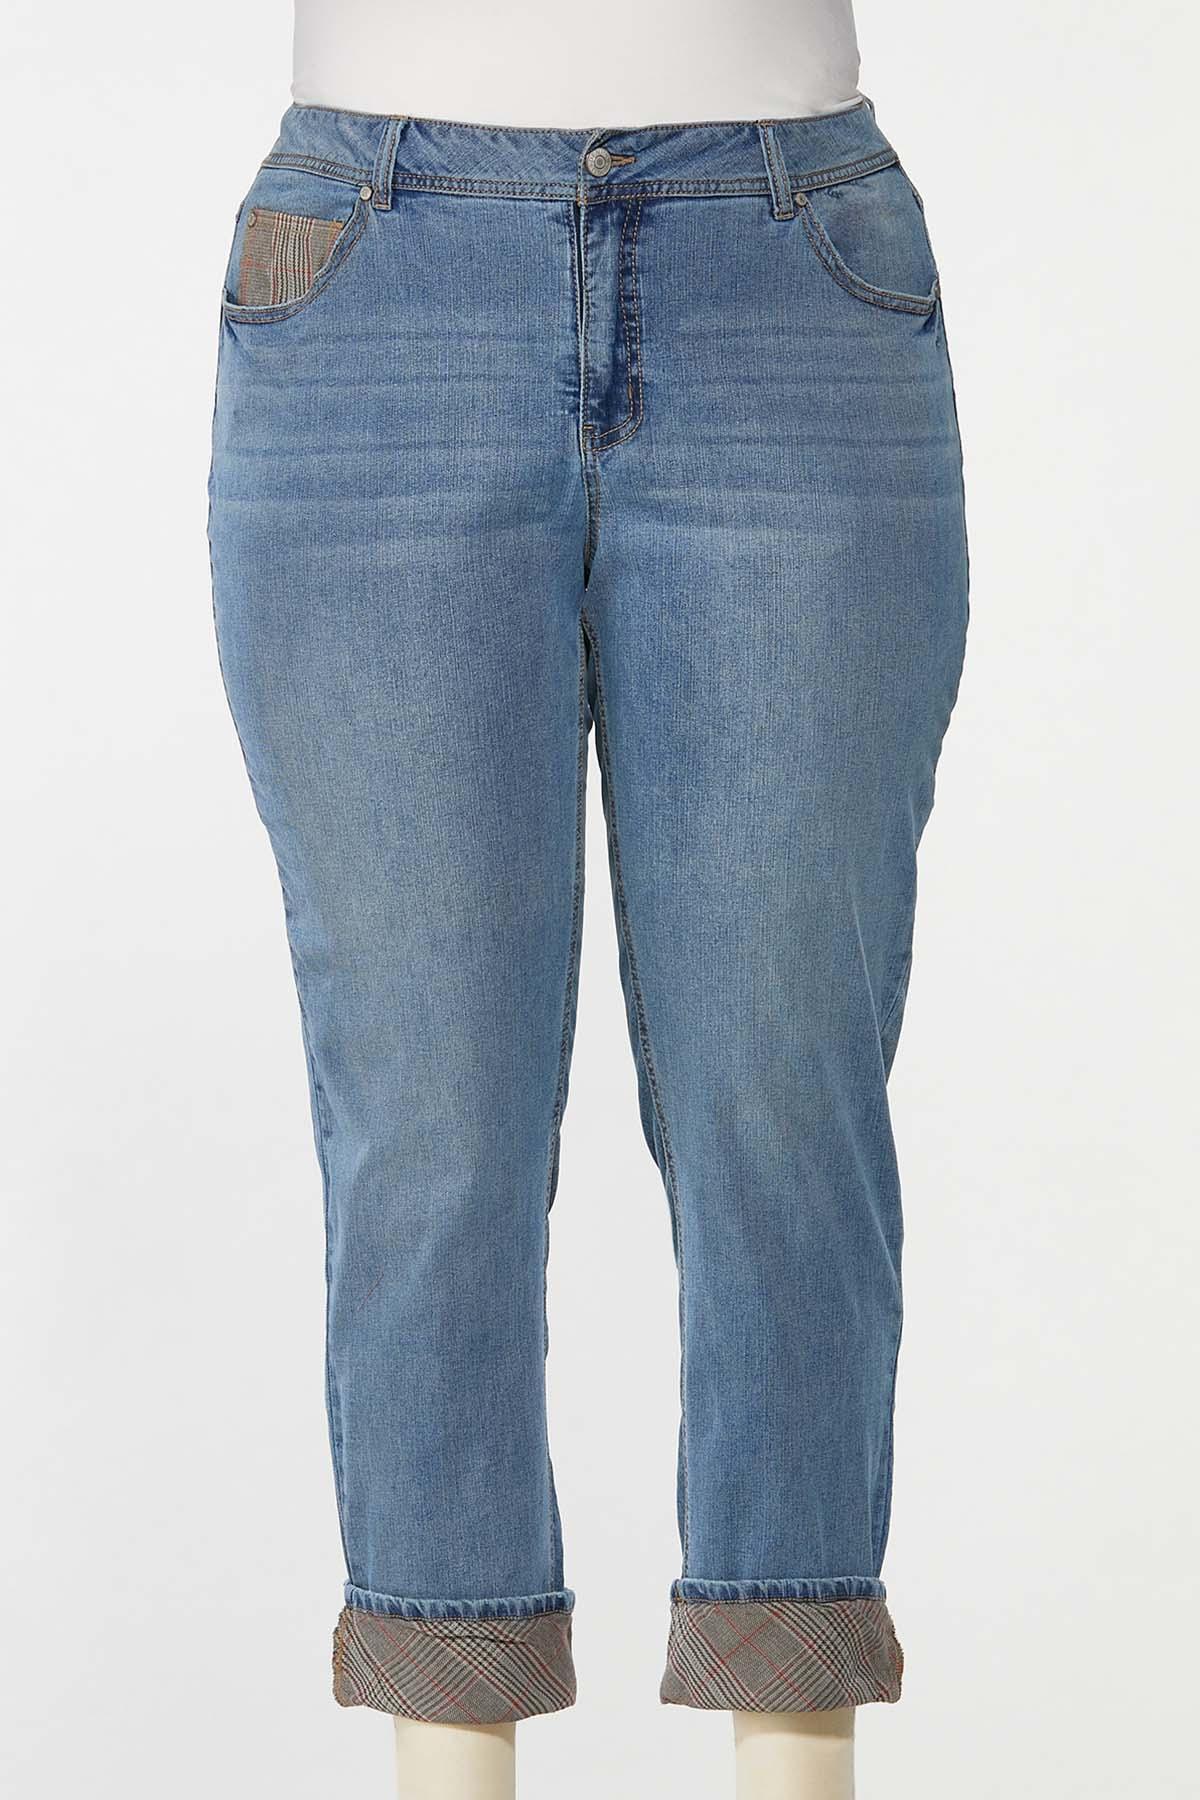 Plus Size Plaid Cuff Girlfriend Jeans